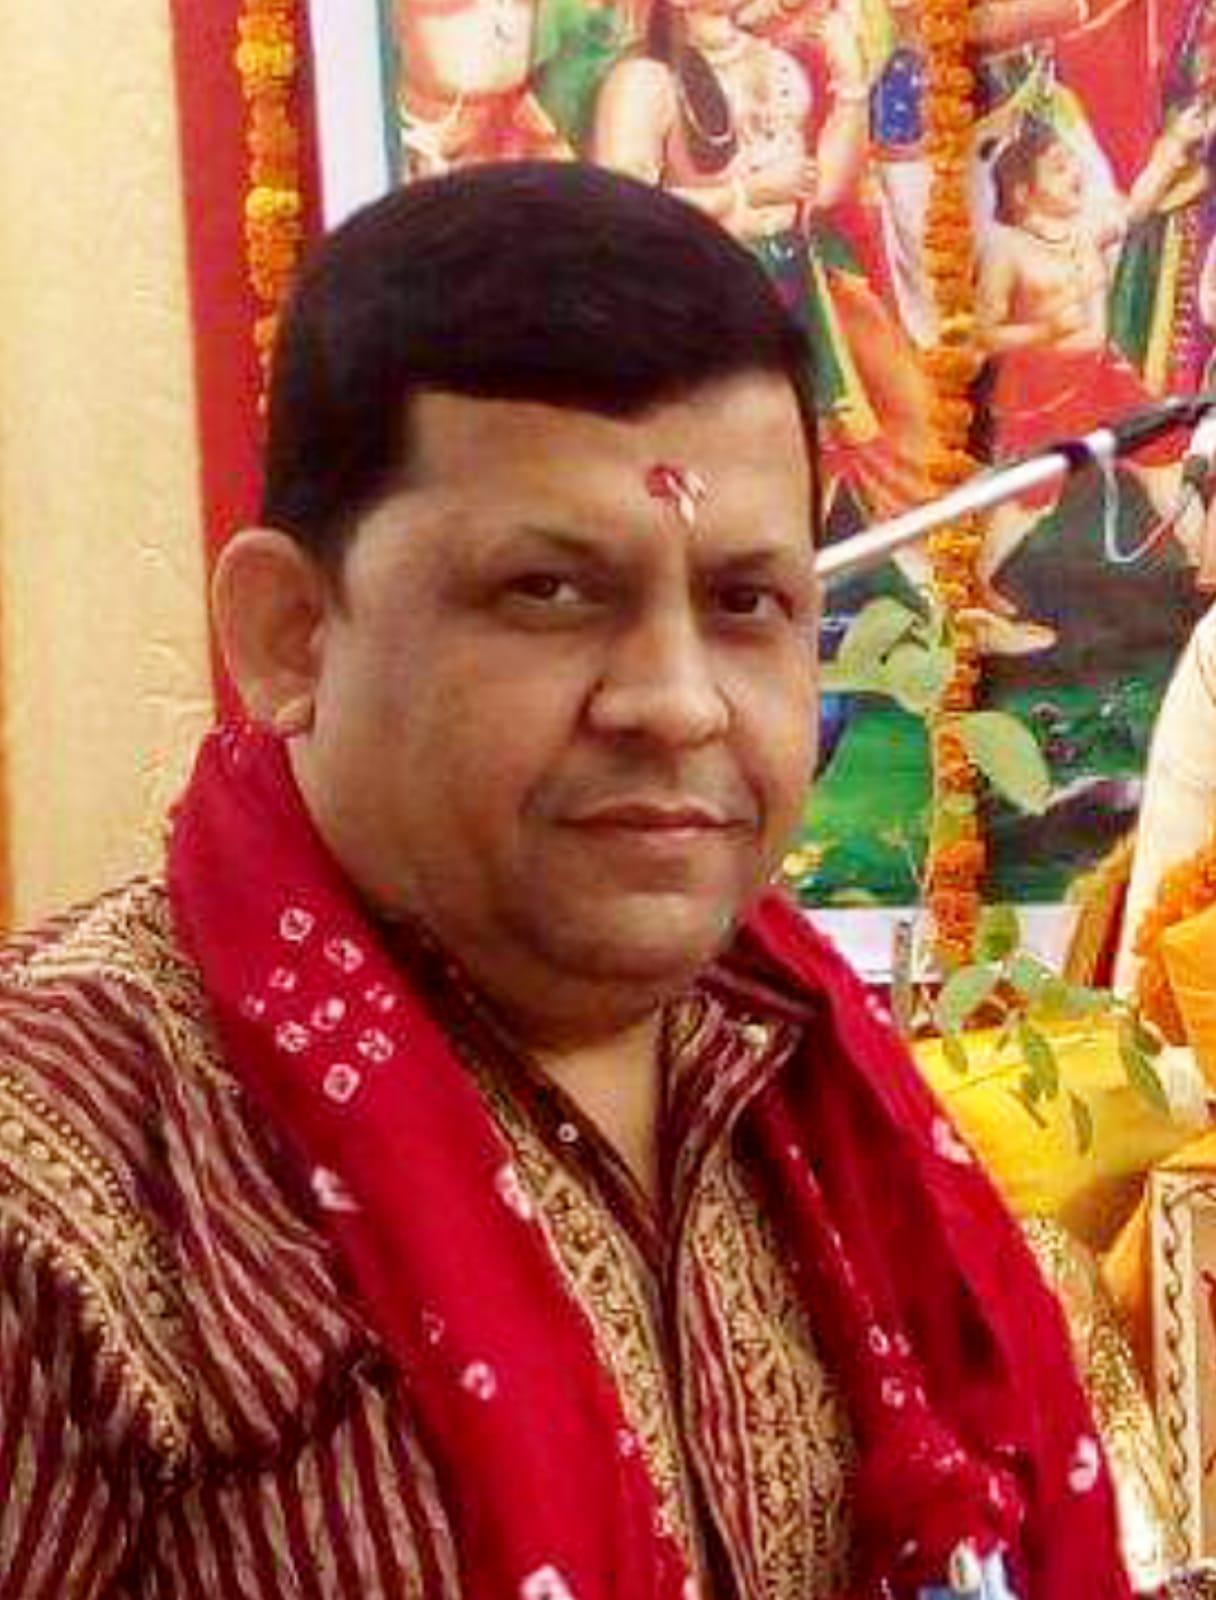 Pt shobhit - Vedic Astrologer